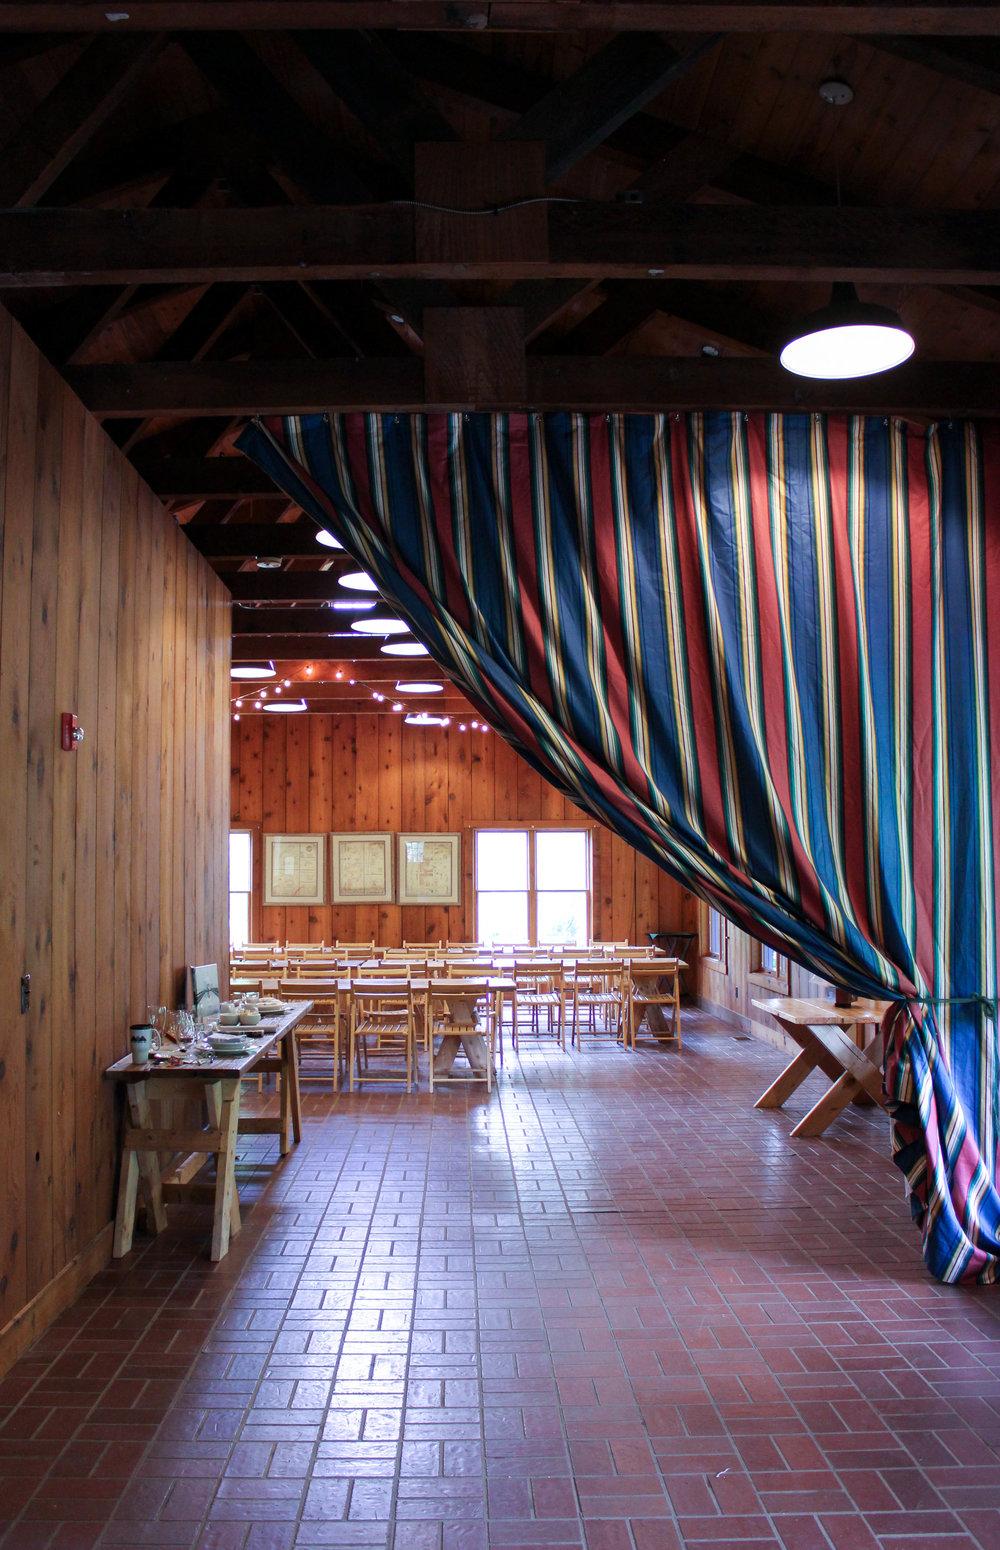 curtain-4699.jpg